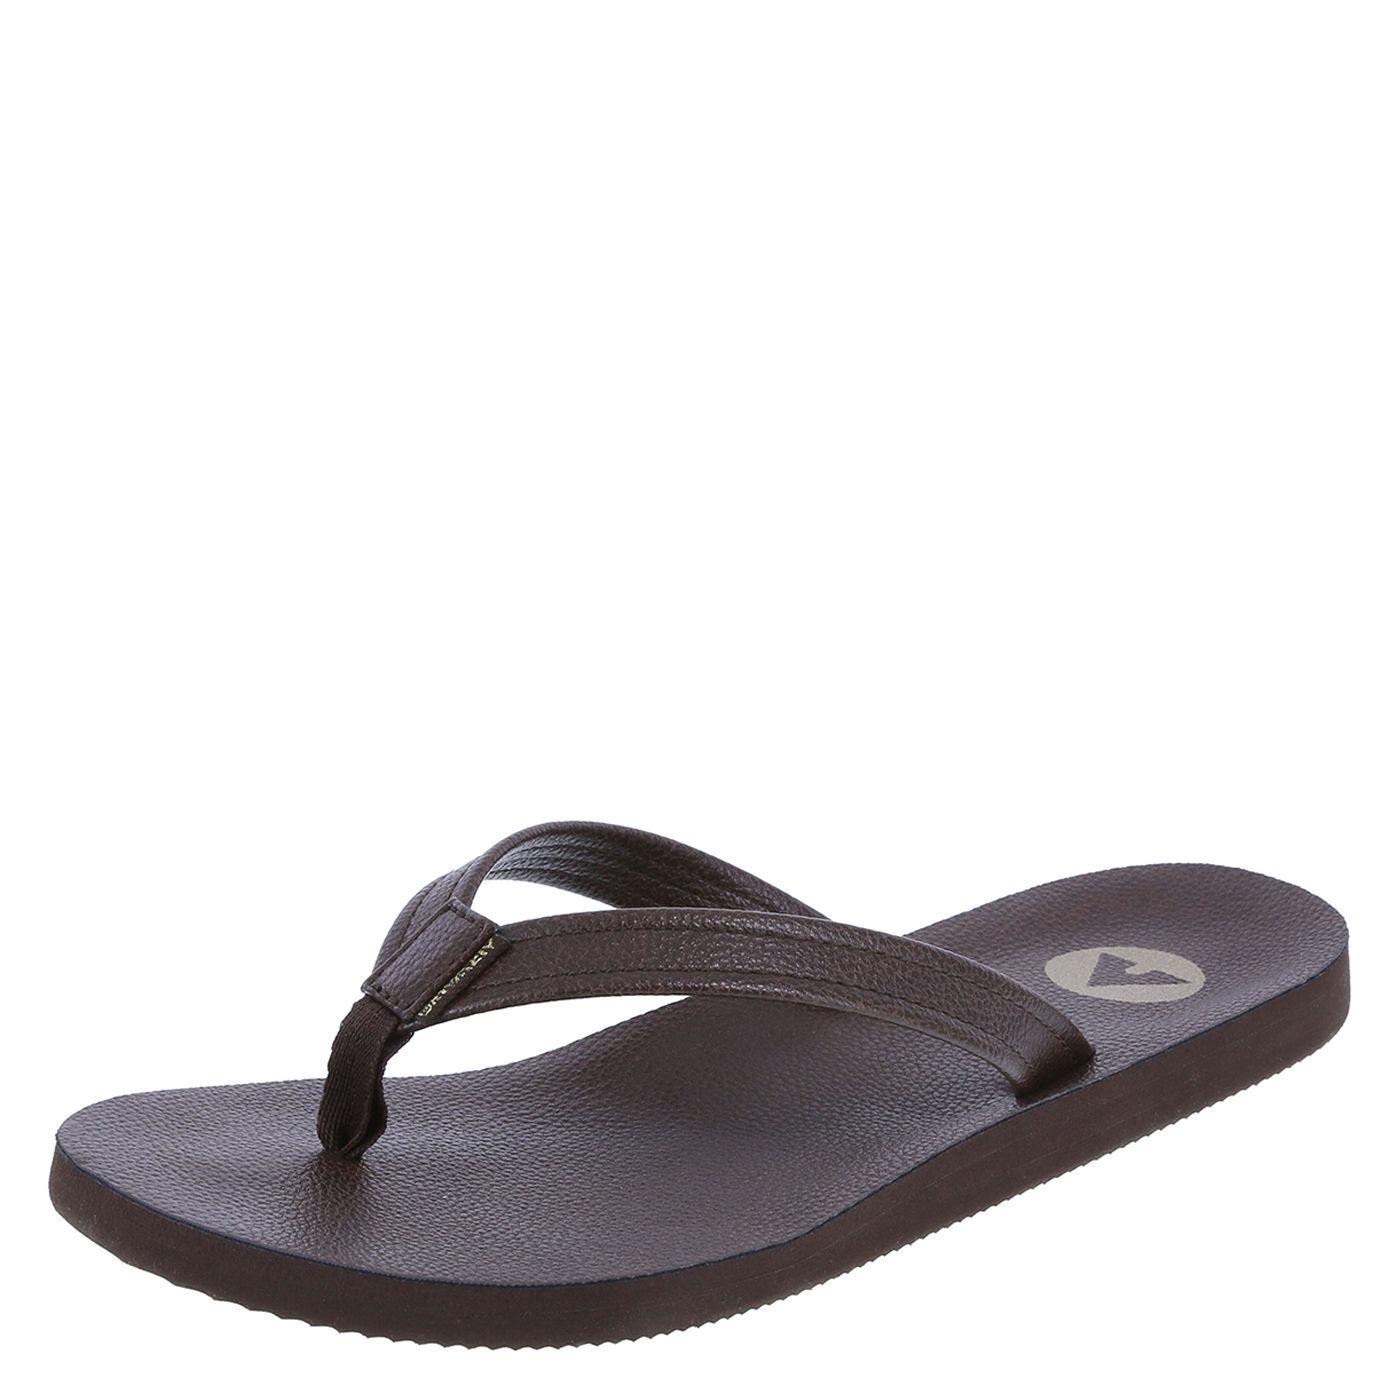 Airwalk Tune Women's Flip Flop Sandal